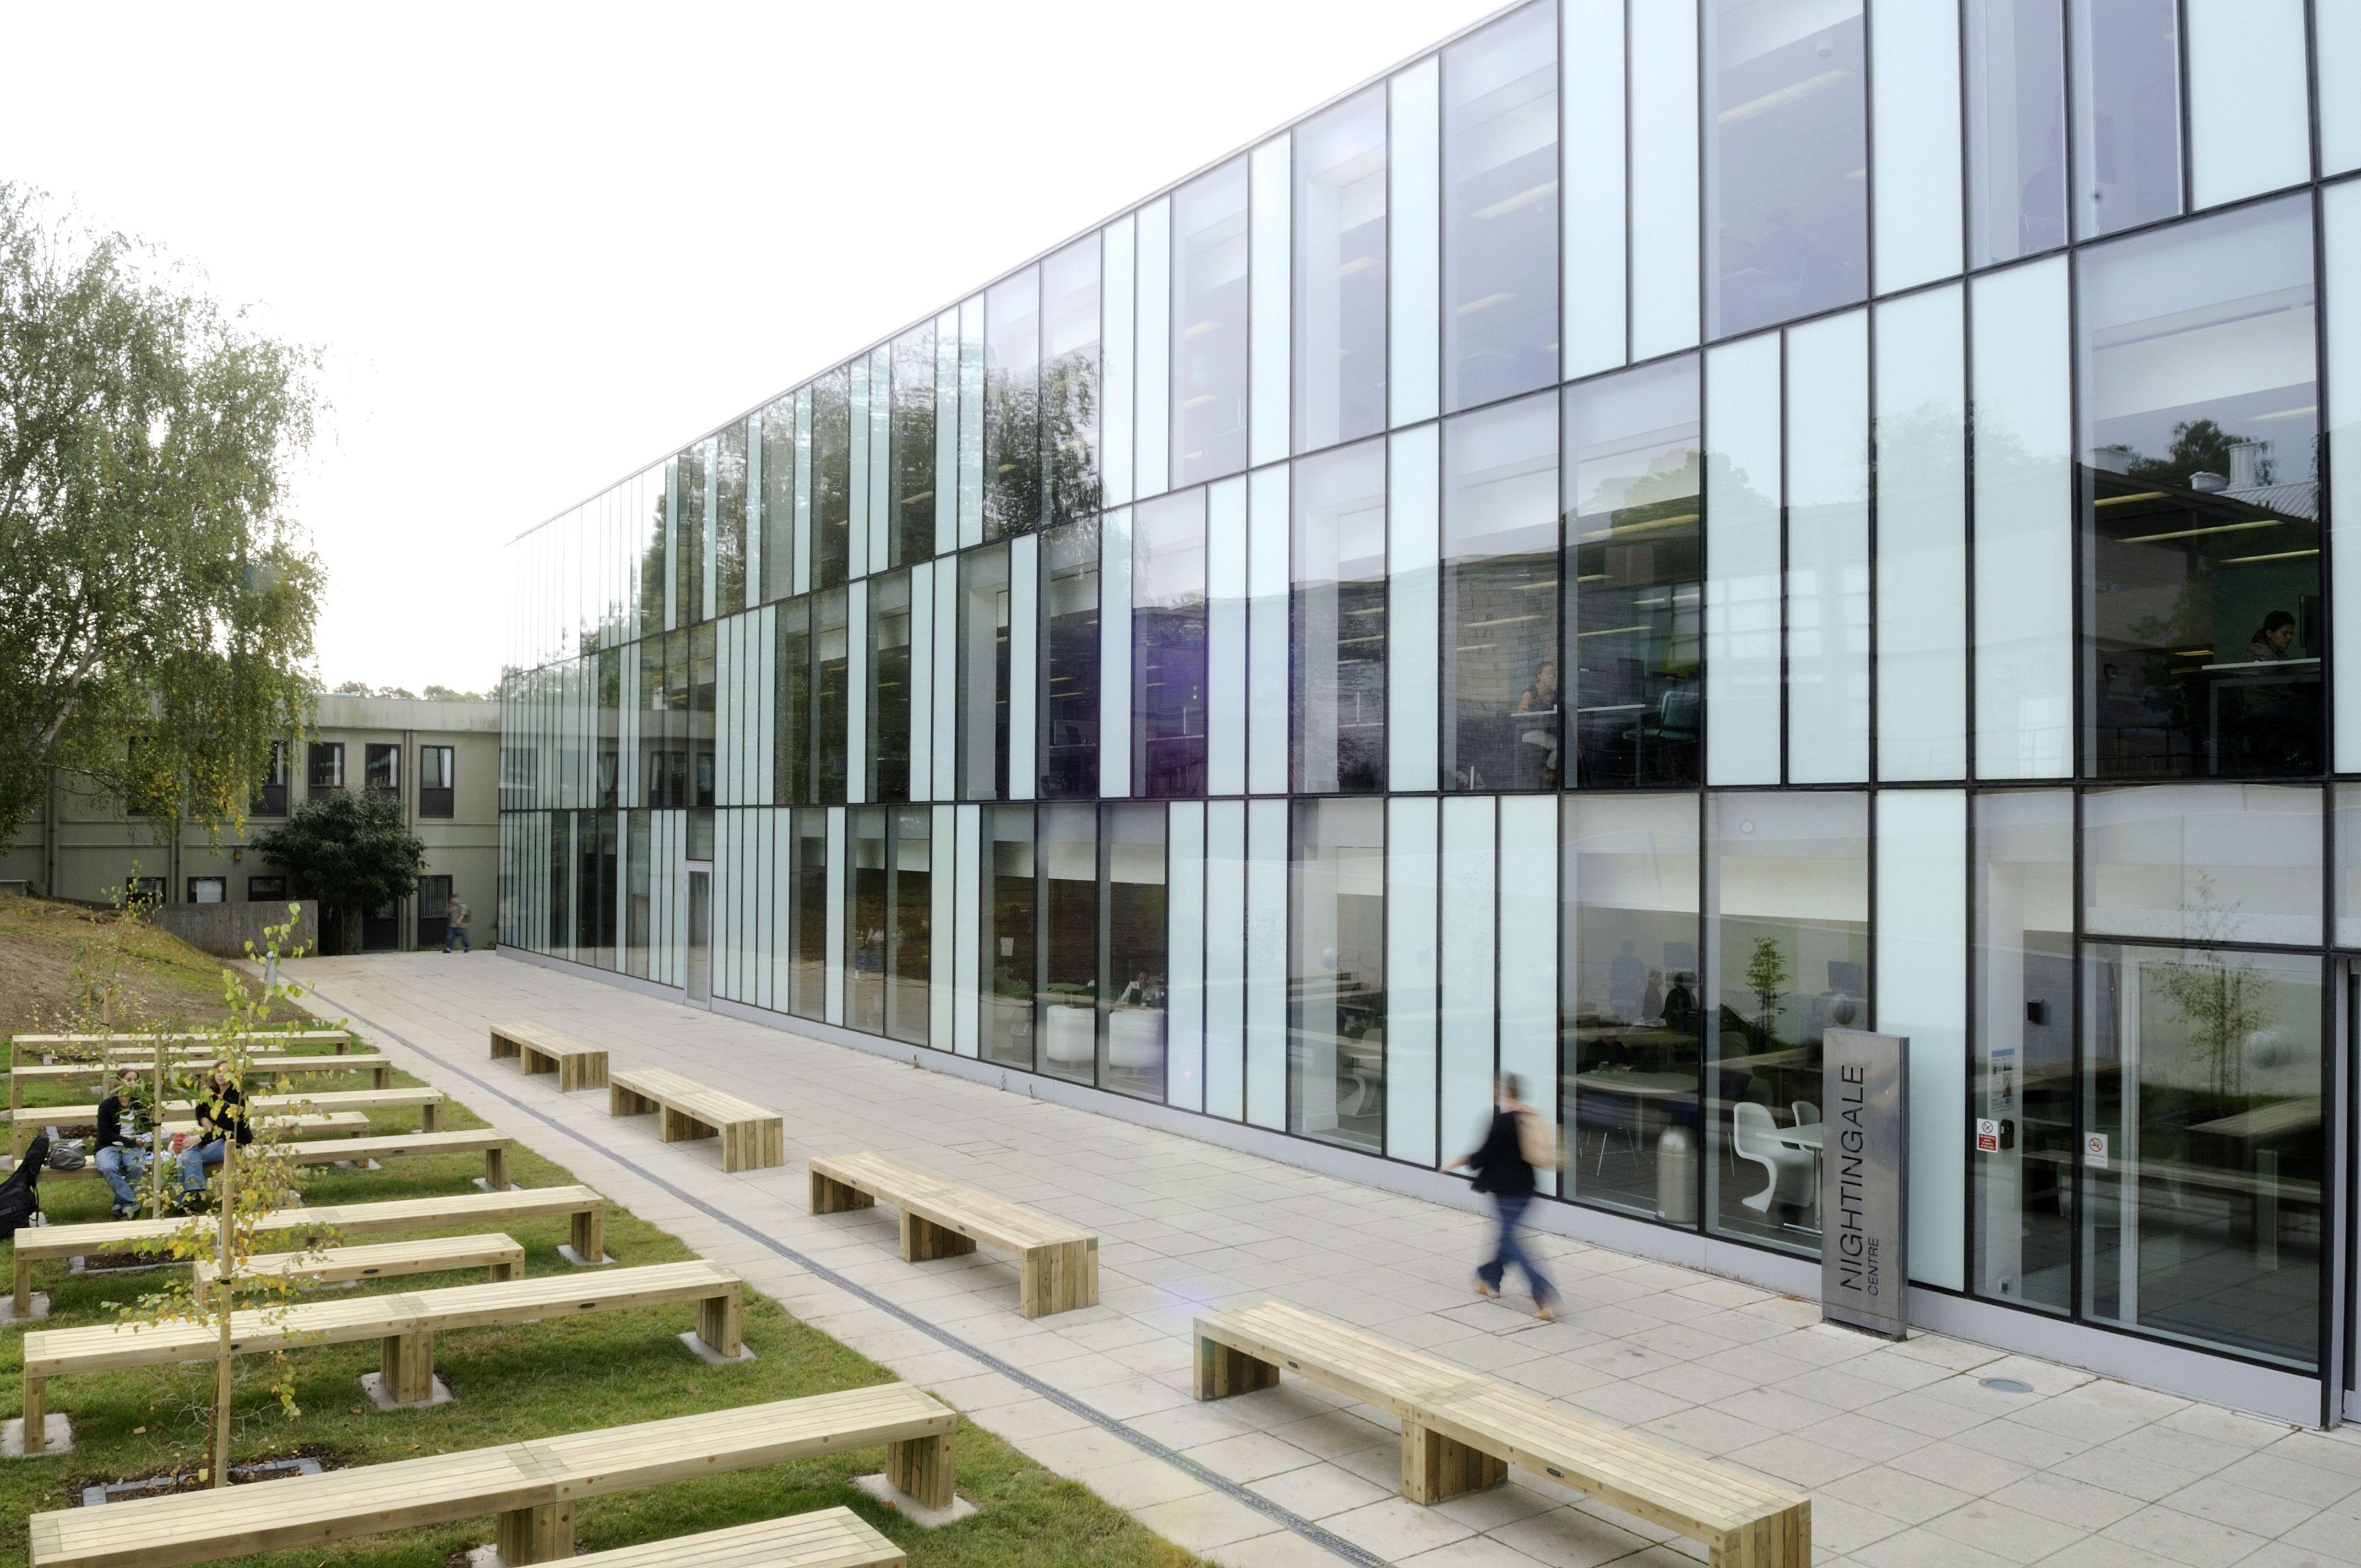 Fashion designing college in london 64